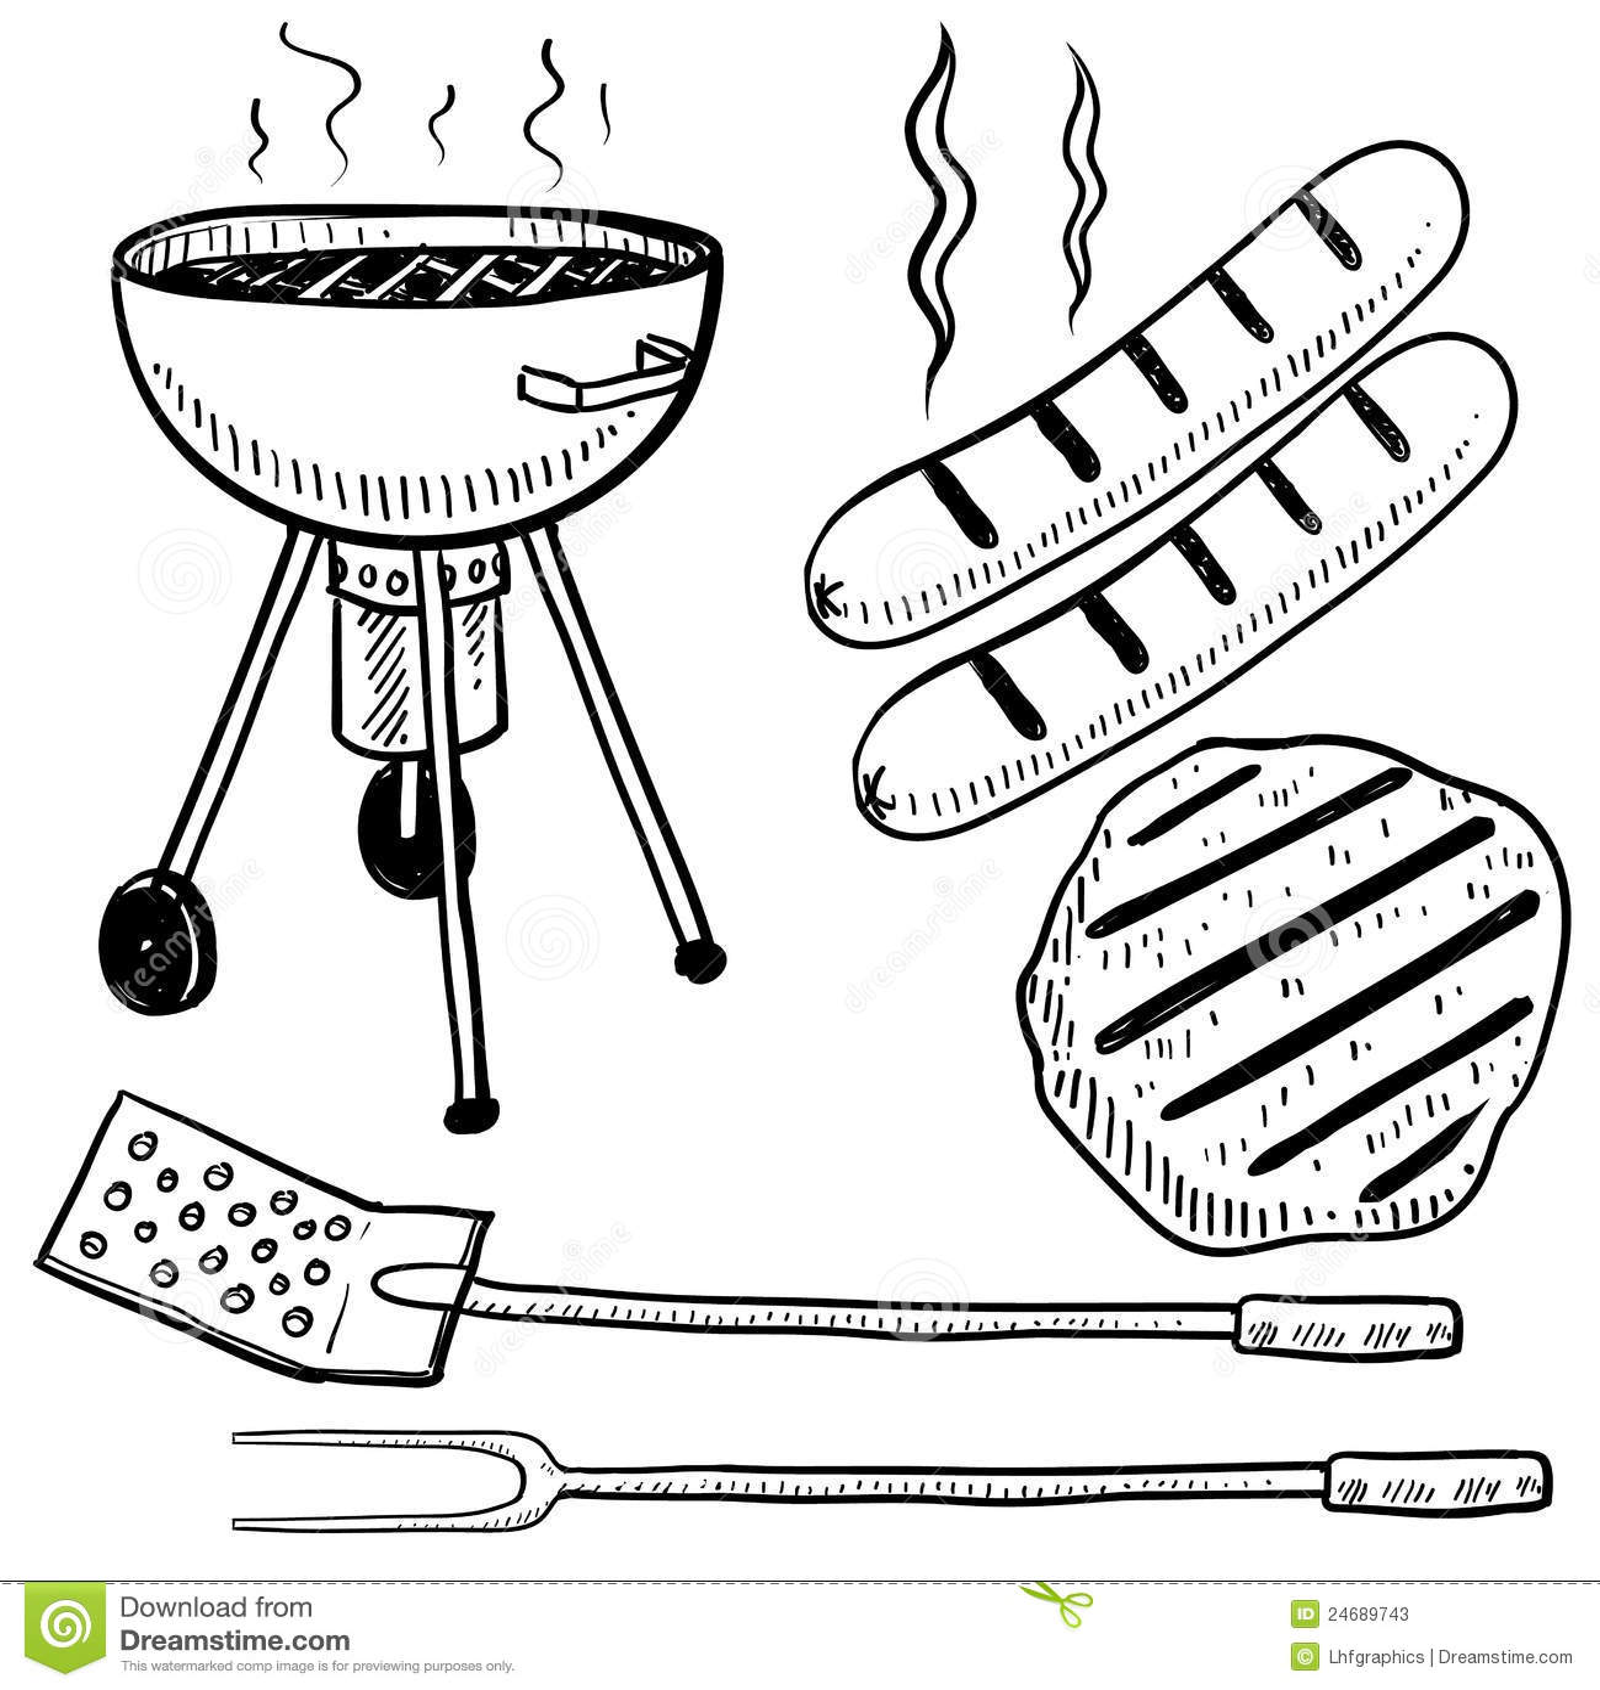 Hipster Backyard Bbq : Backyard Barbecue Equipment Sketch Stock Photos  Image 24689743